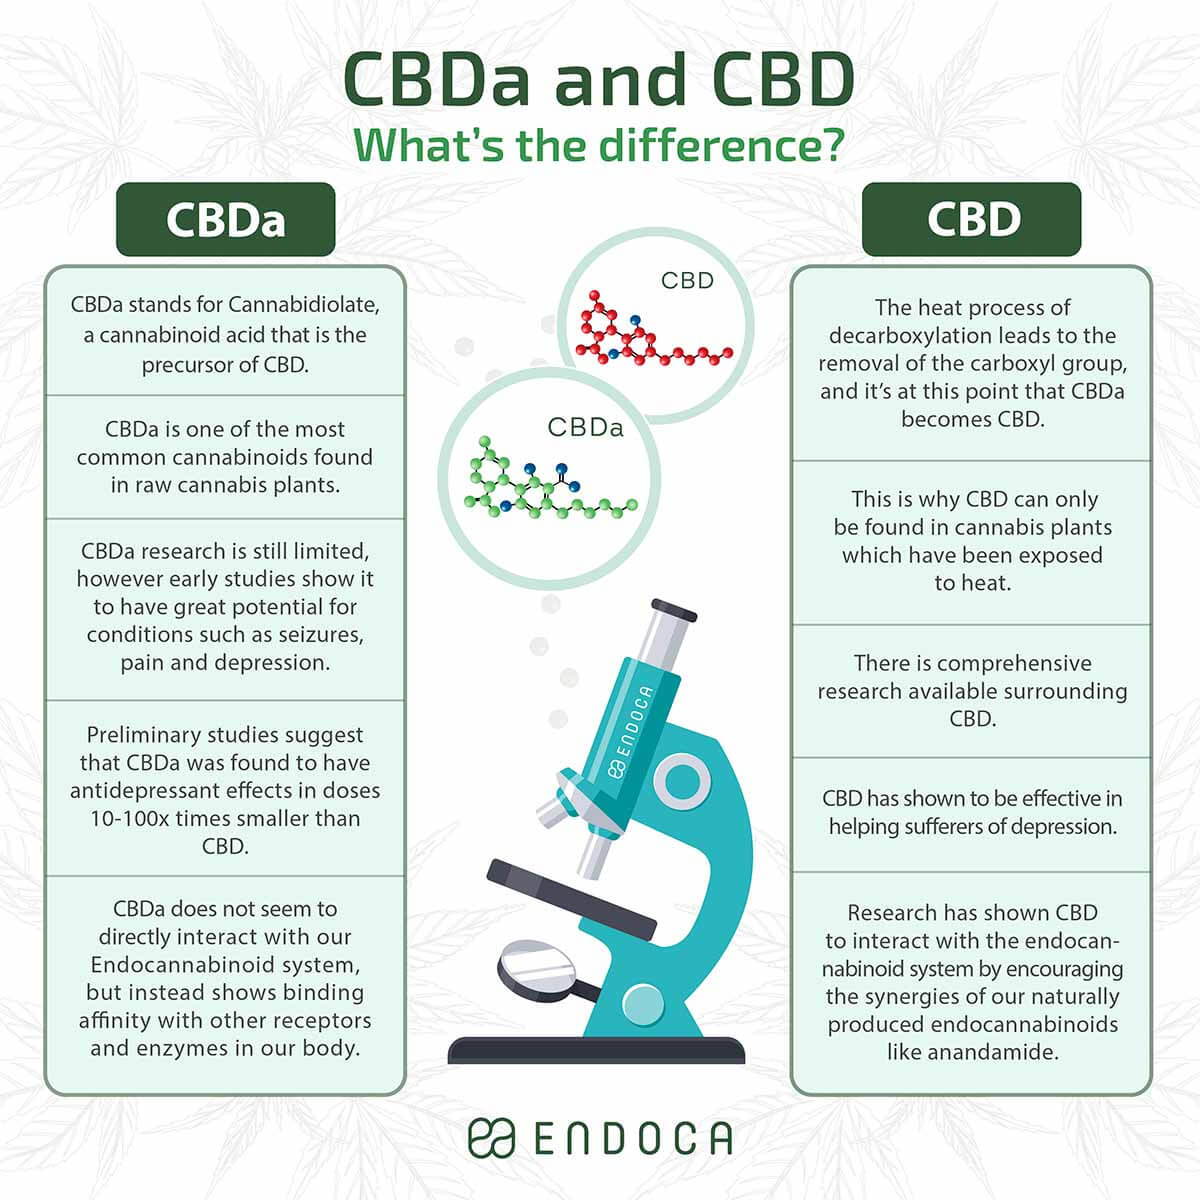 CBD vs CBDa infographic